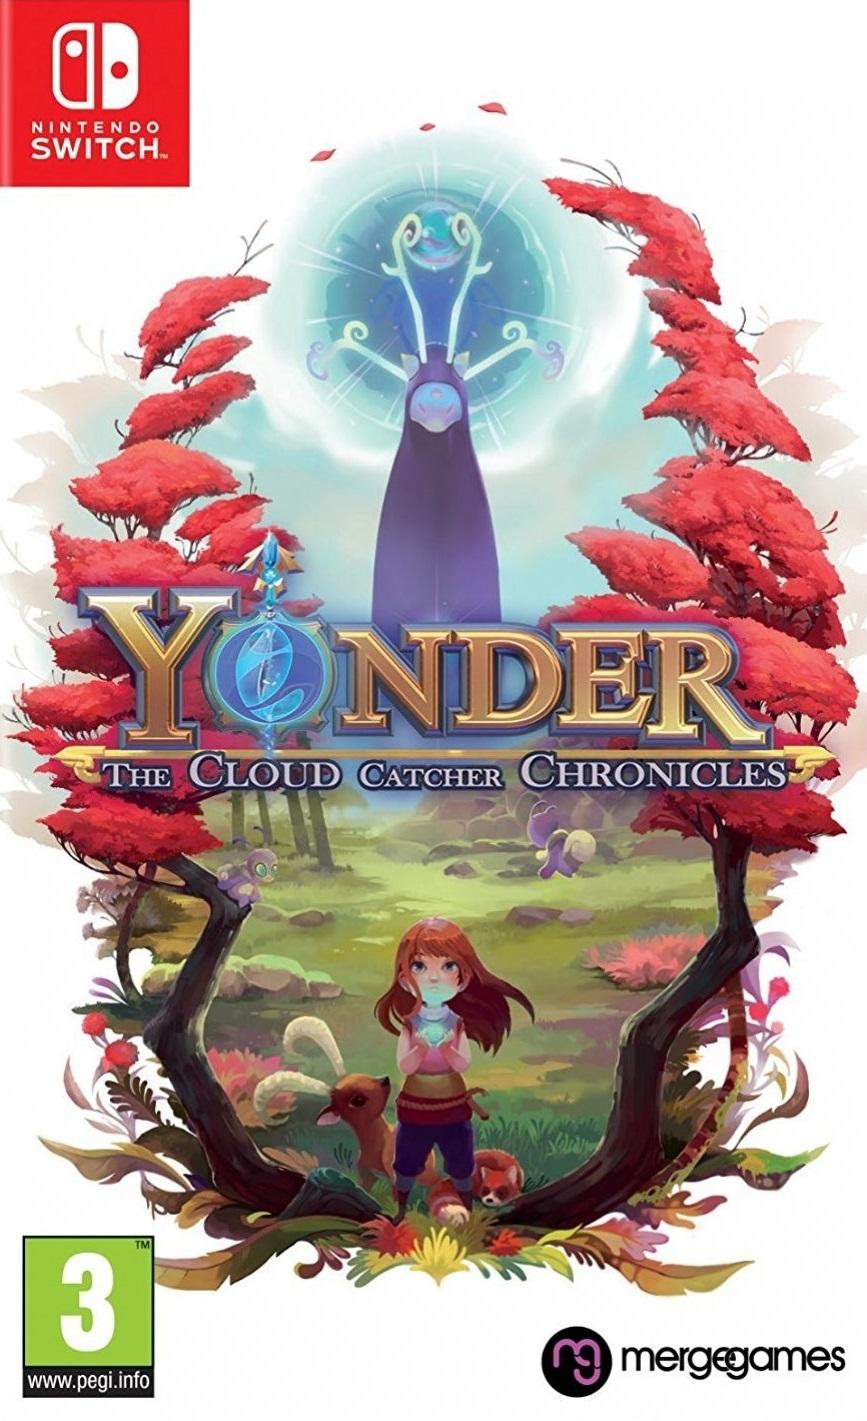 yonder-the-cloud-catcher-chronicles-557893.7.jpg